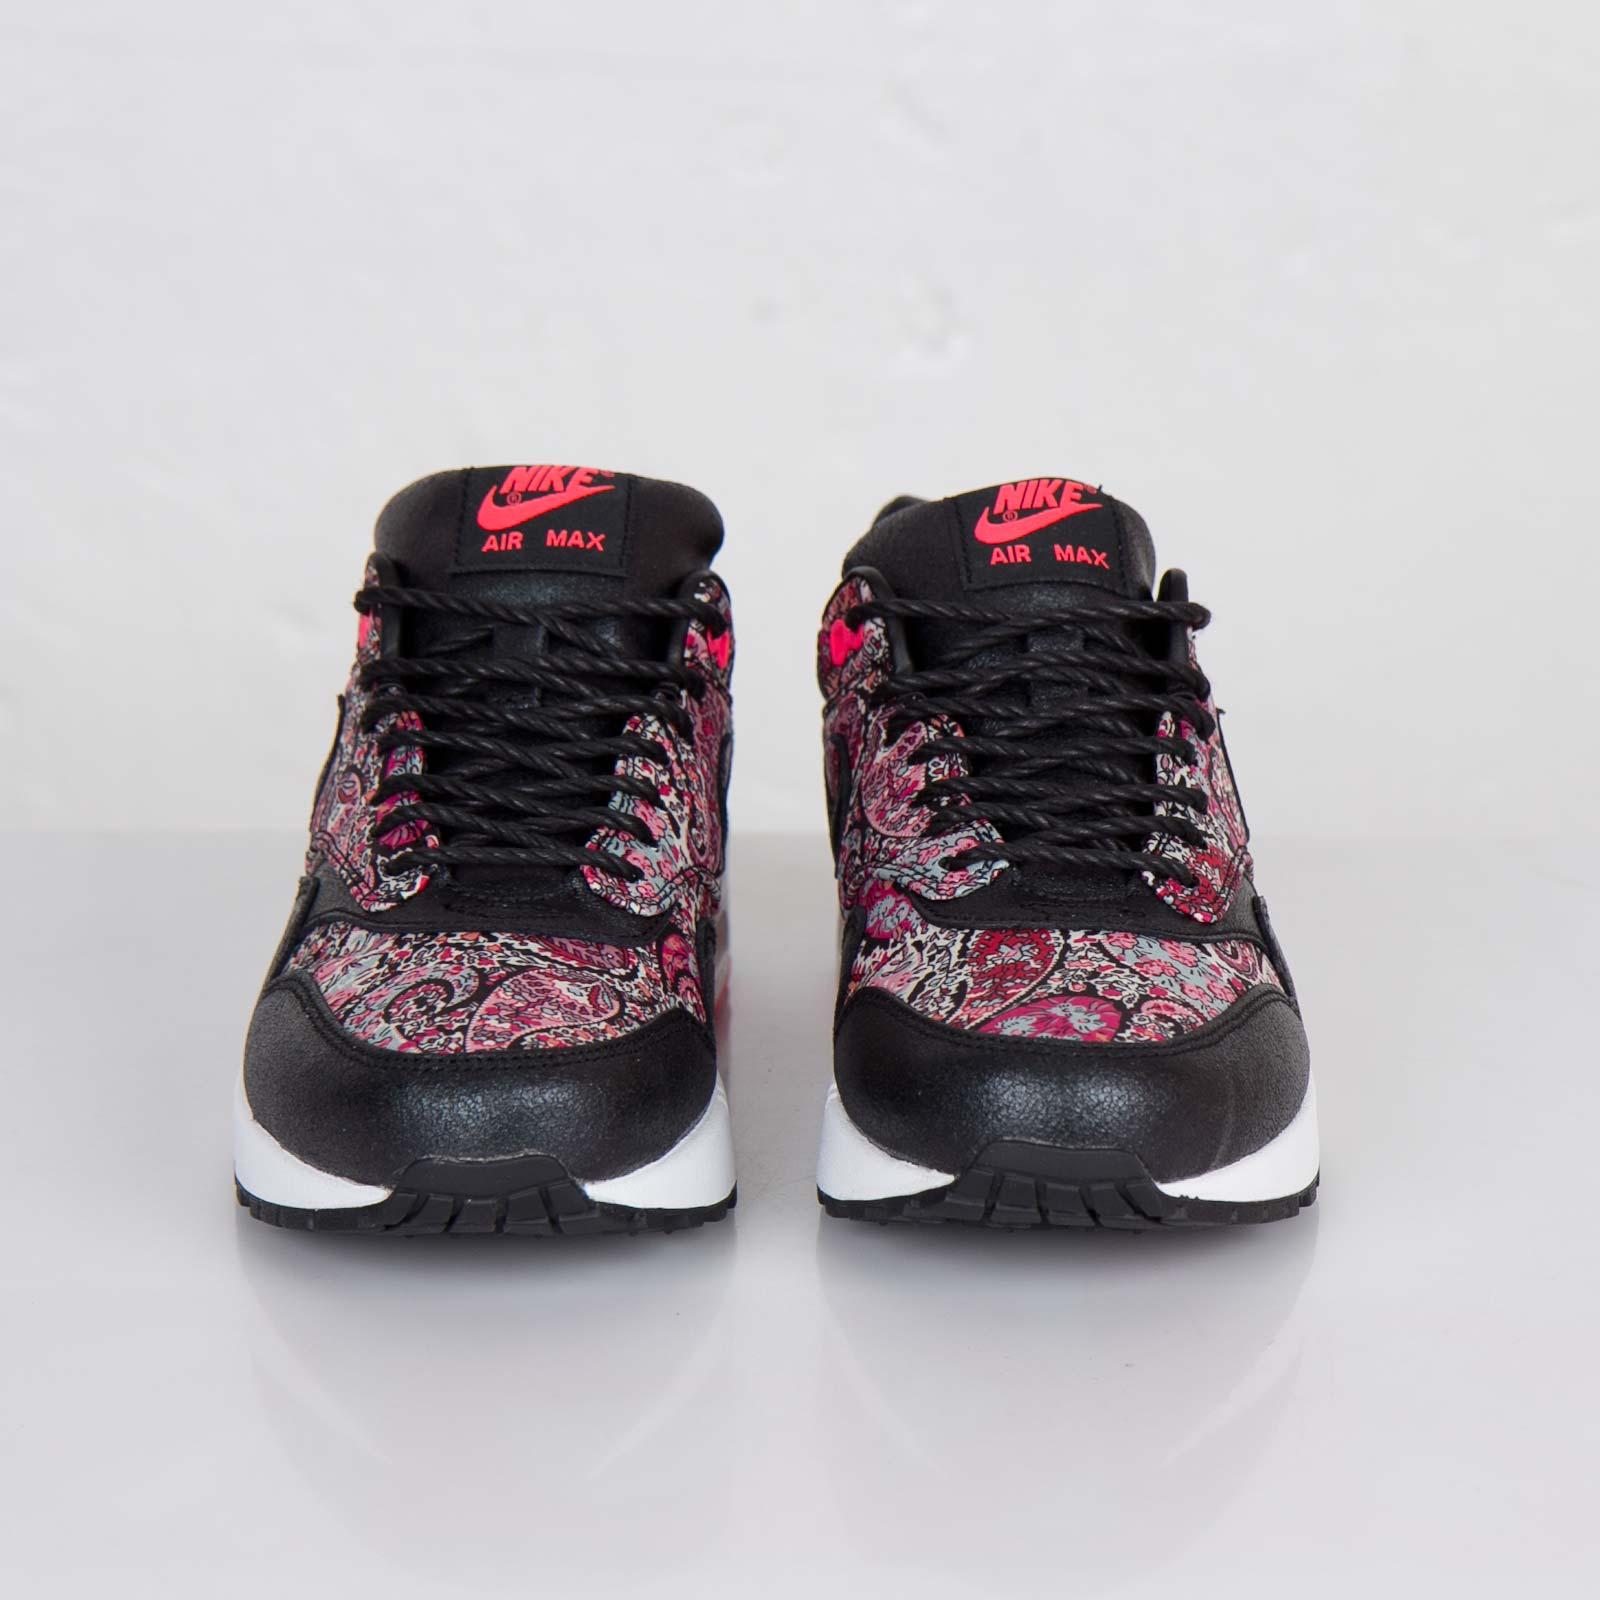 sports shoes d94db 5f547 Nike Wmns Air Max 1 Liberty QS - 540855-006 - Sneakersnstuff   sneakers    streetwear online since 1999